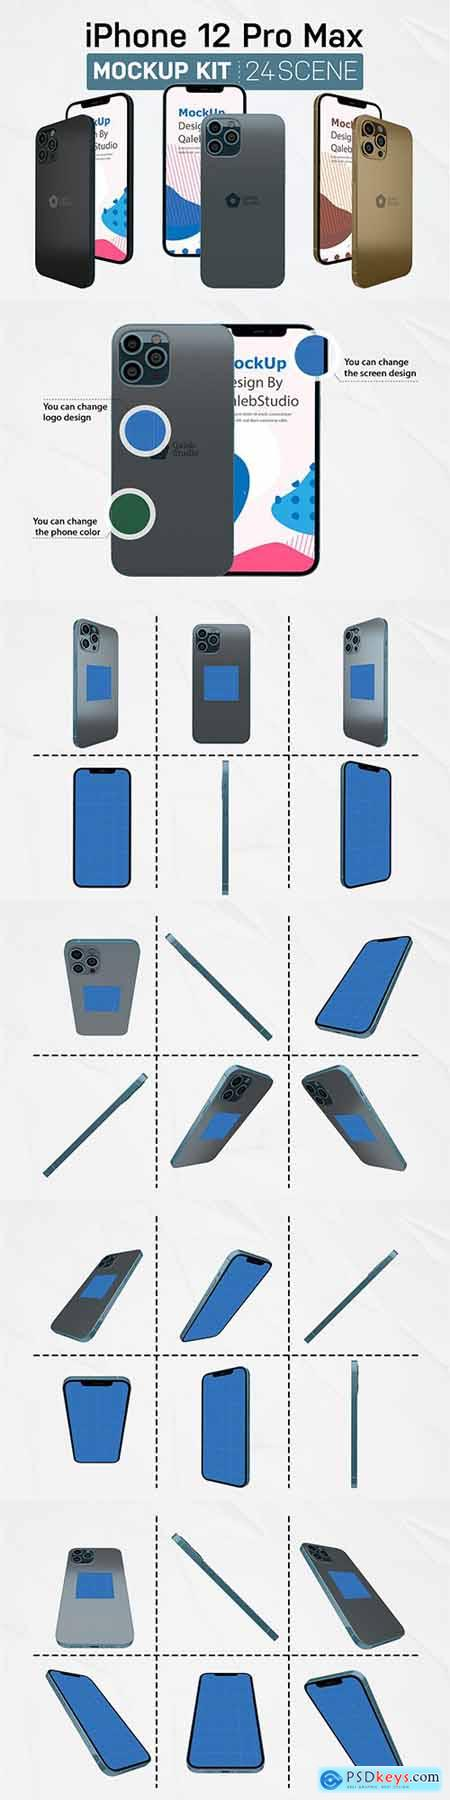 iPhone 12 Kit